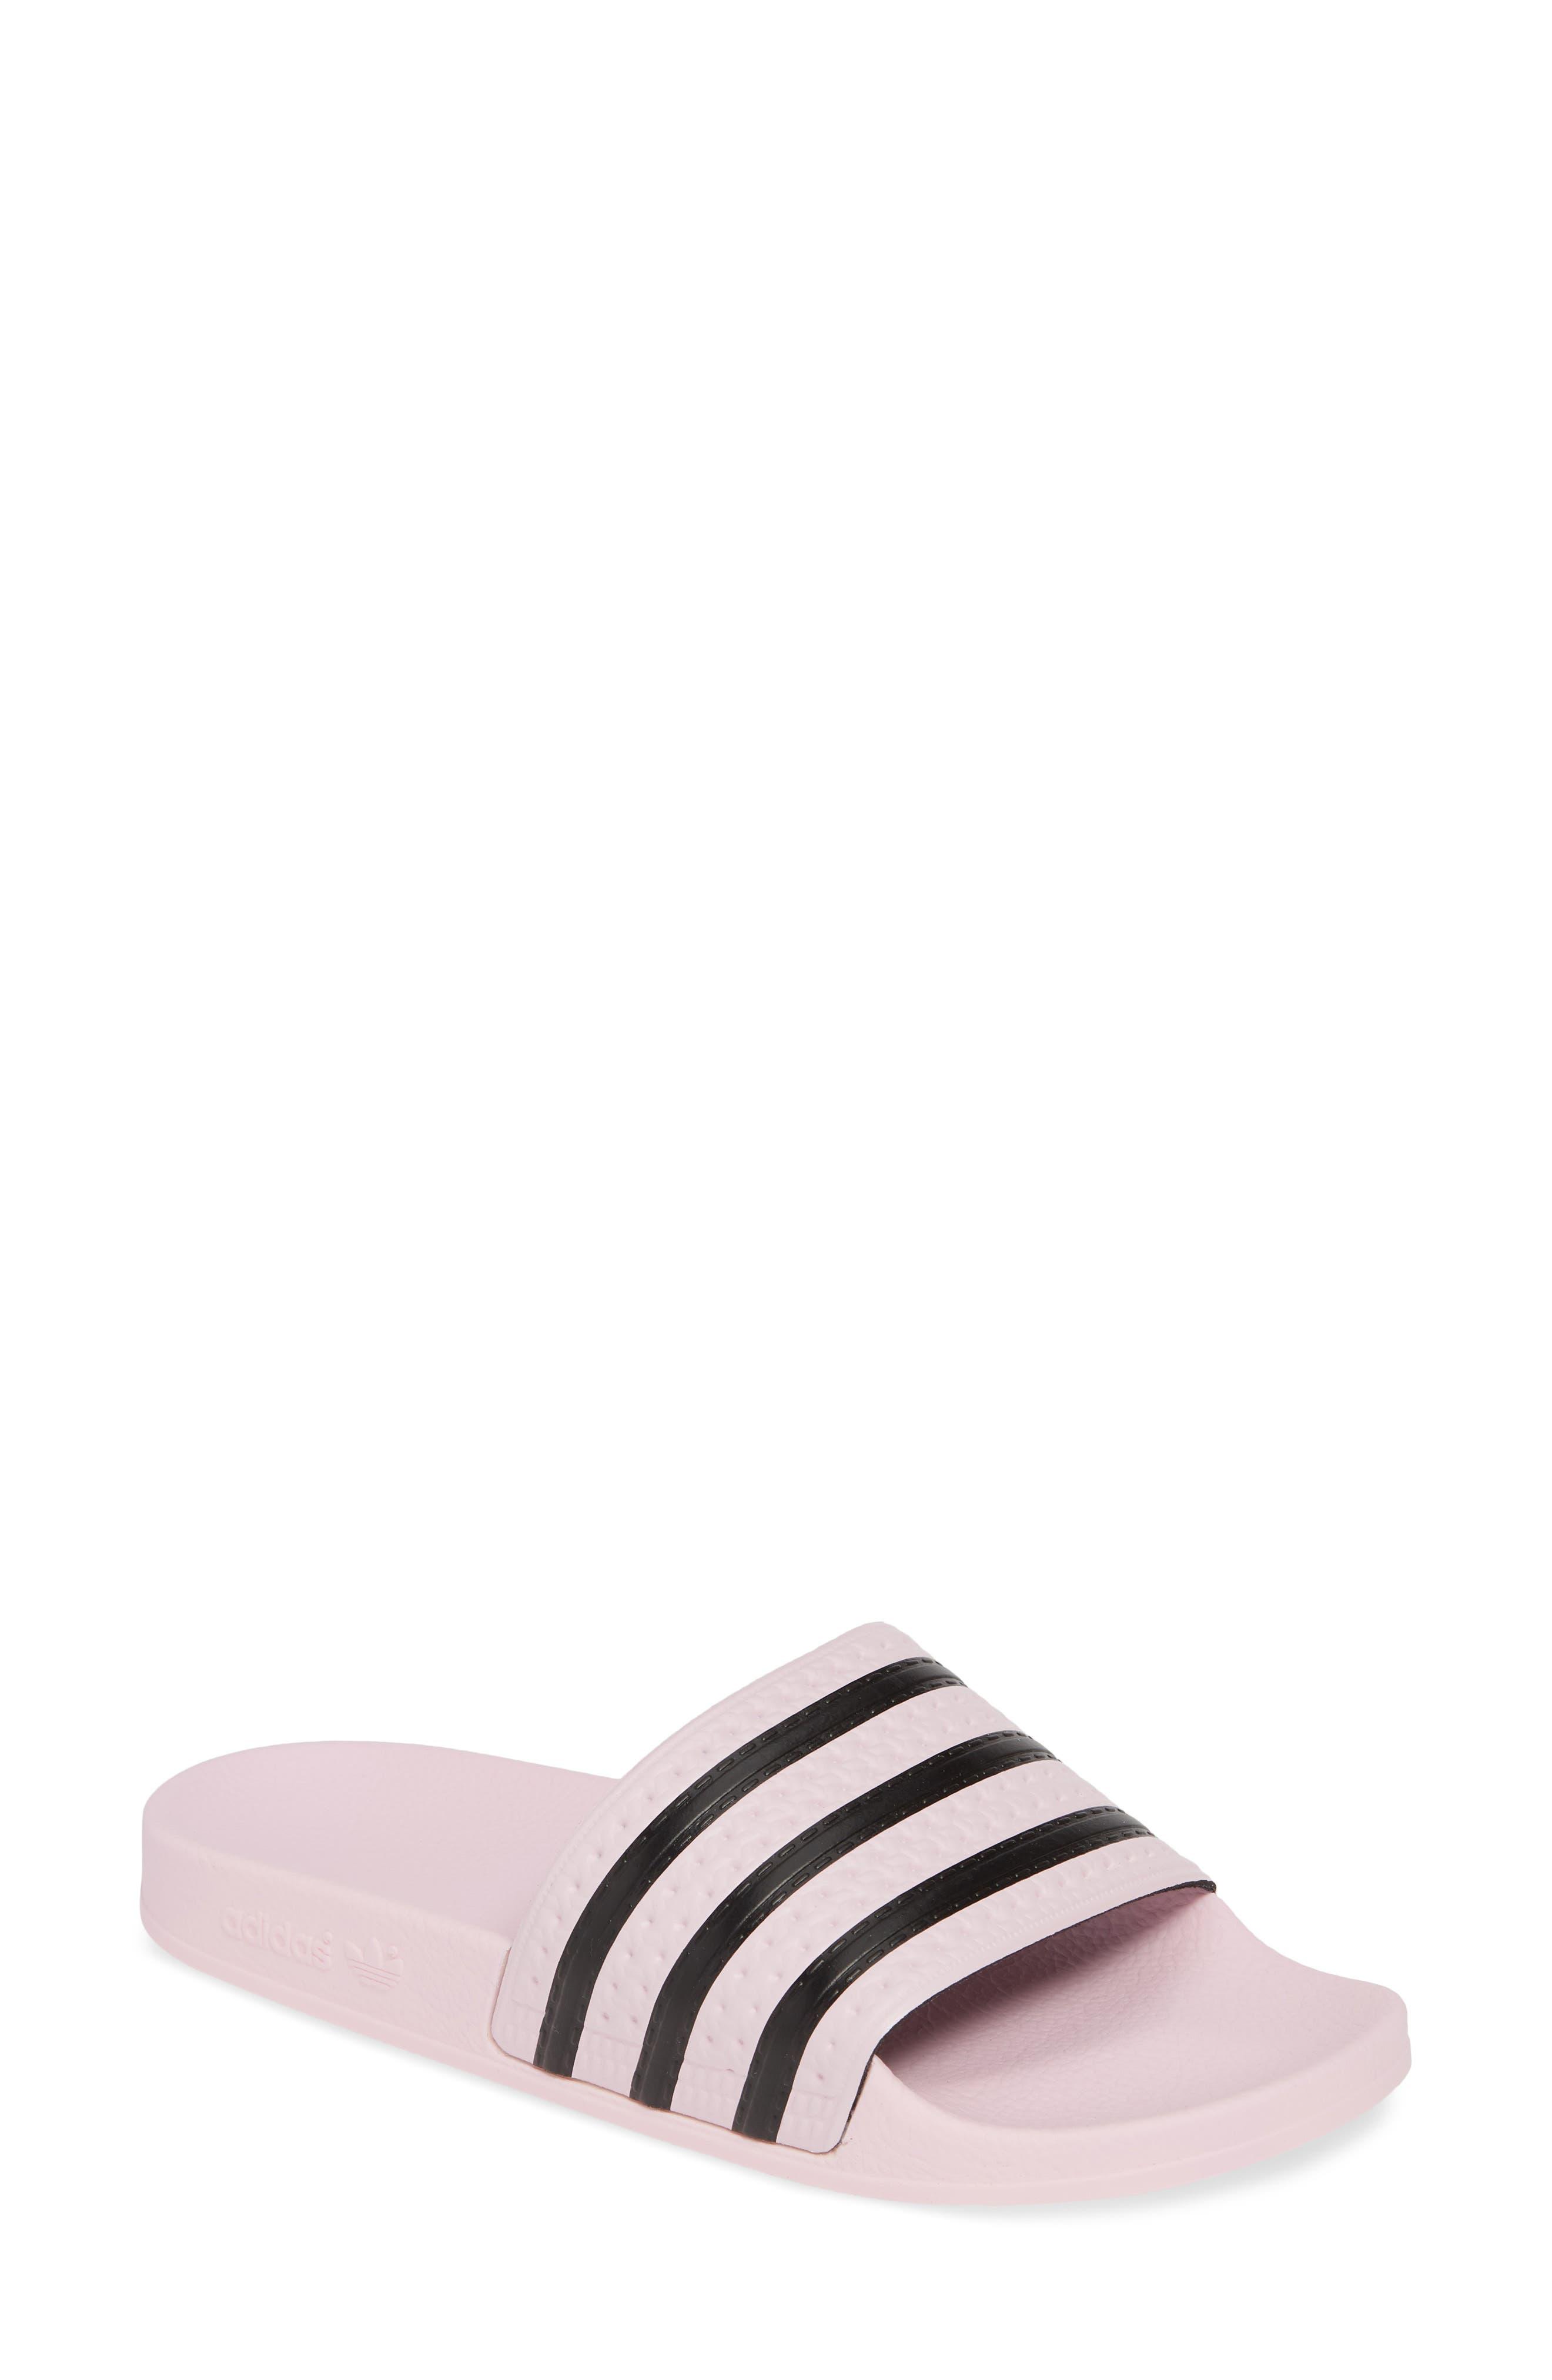 c09d3f852943 adidas sandals